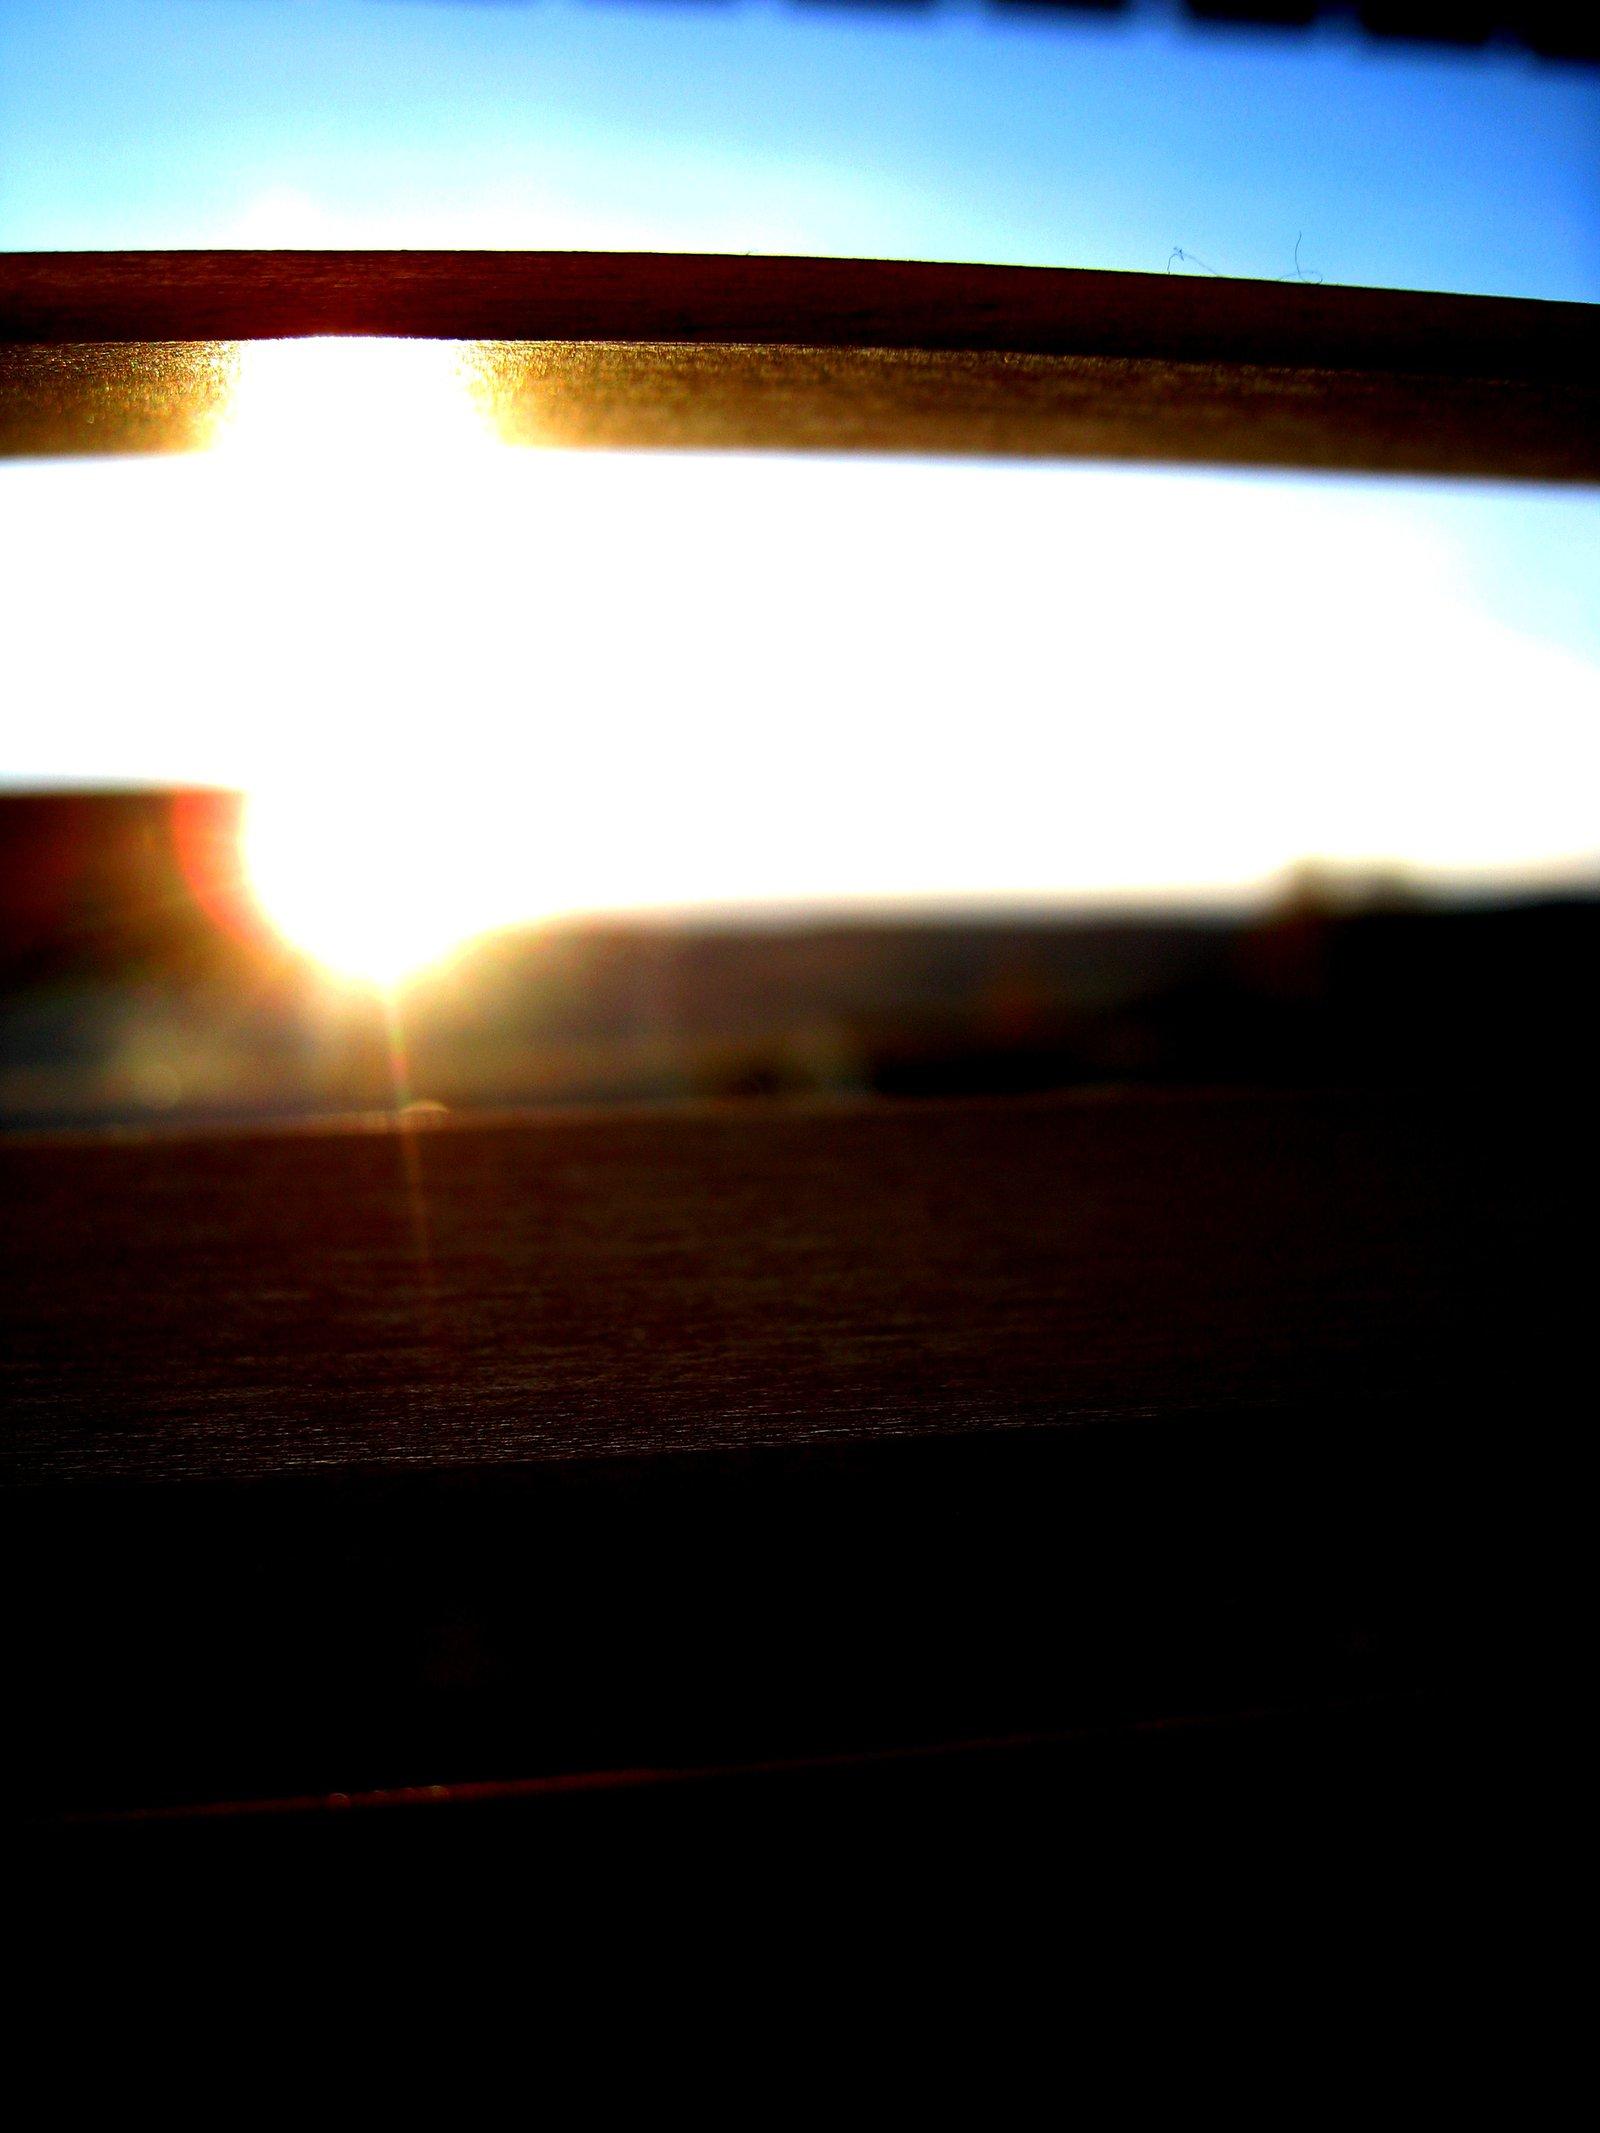 Sunset through window